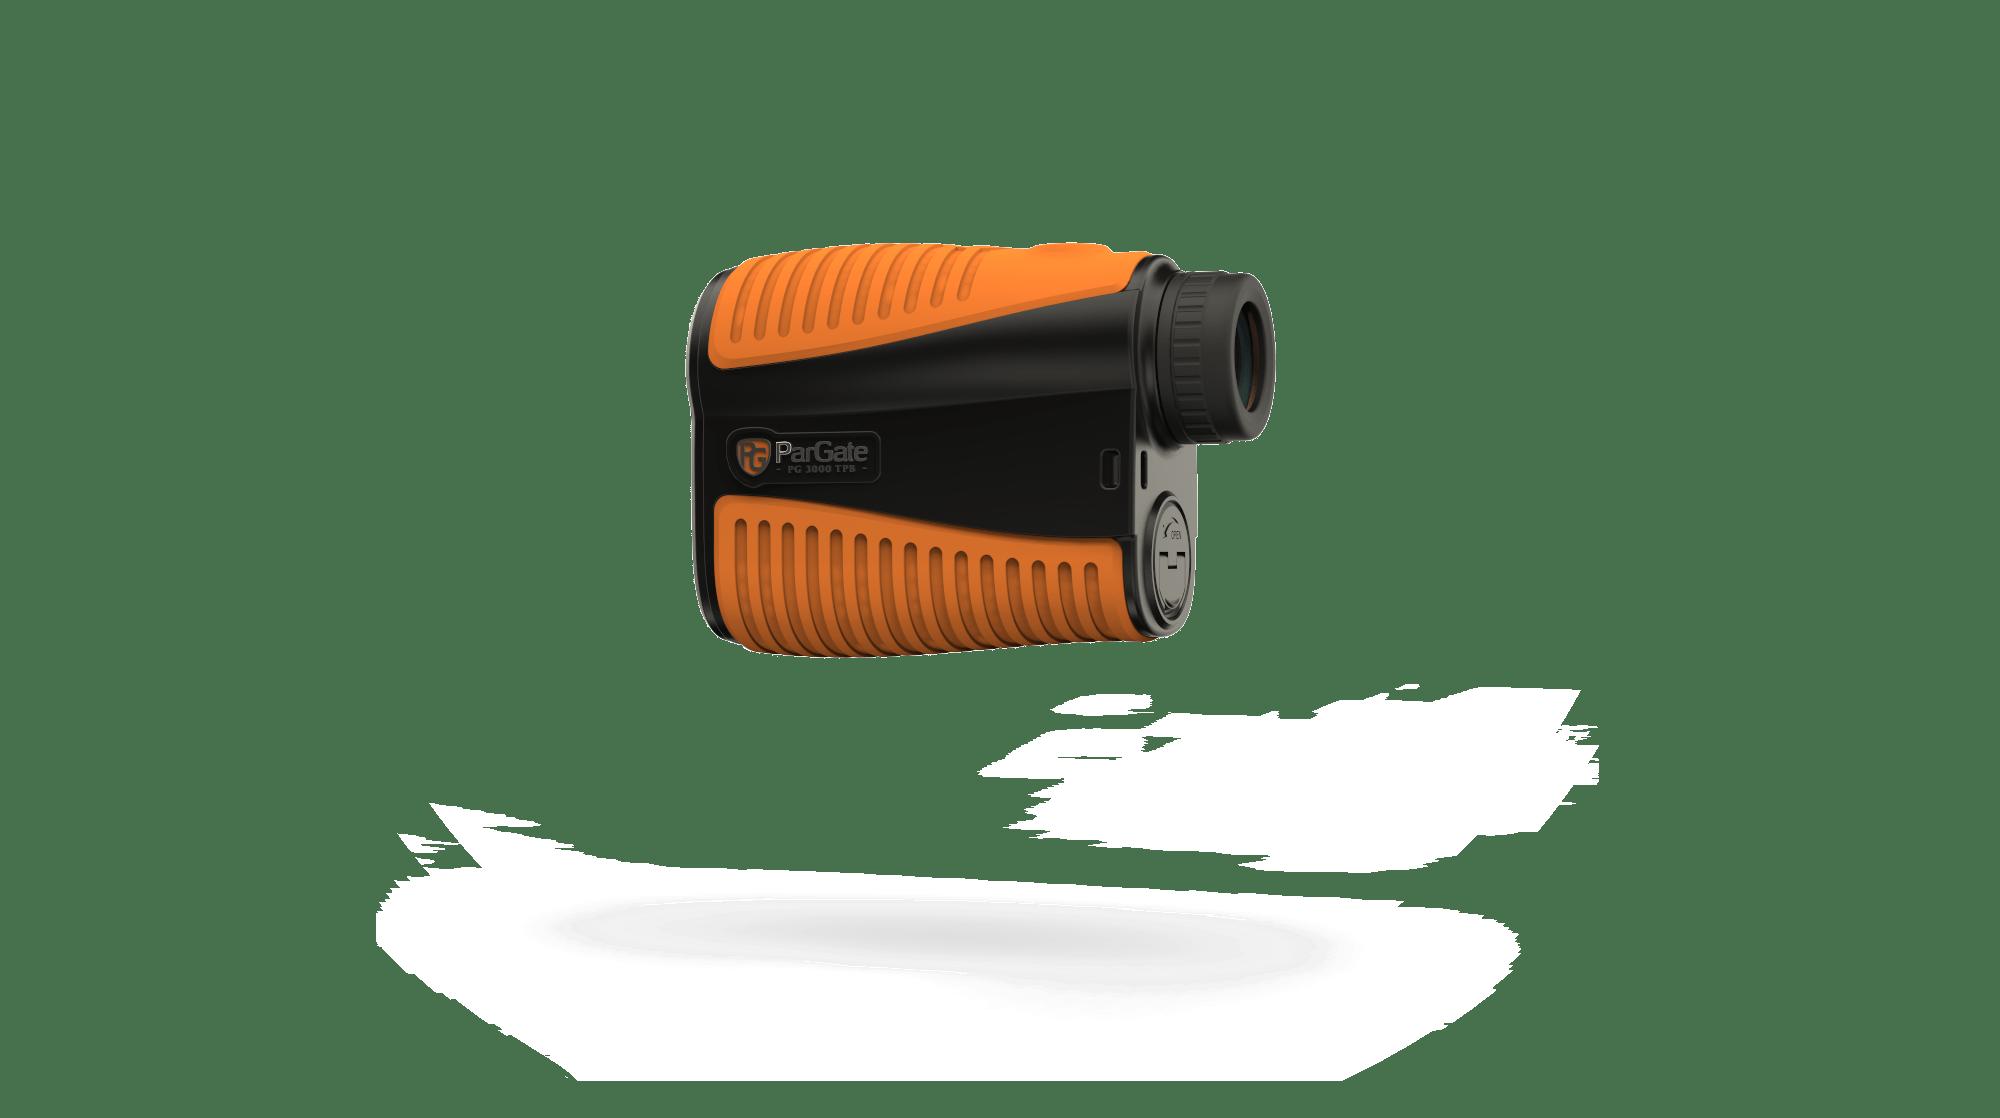 rangefinder-img-17